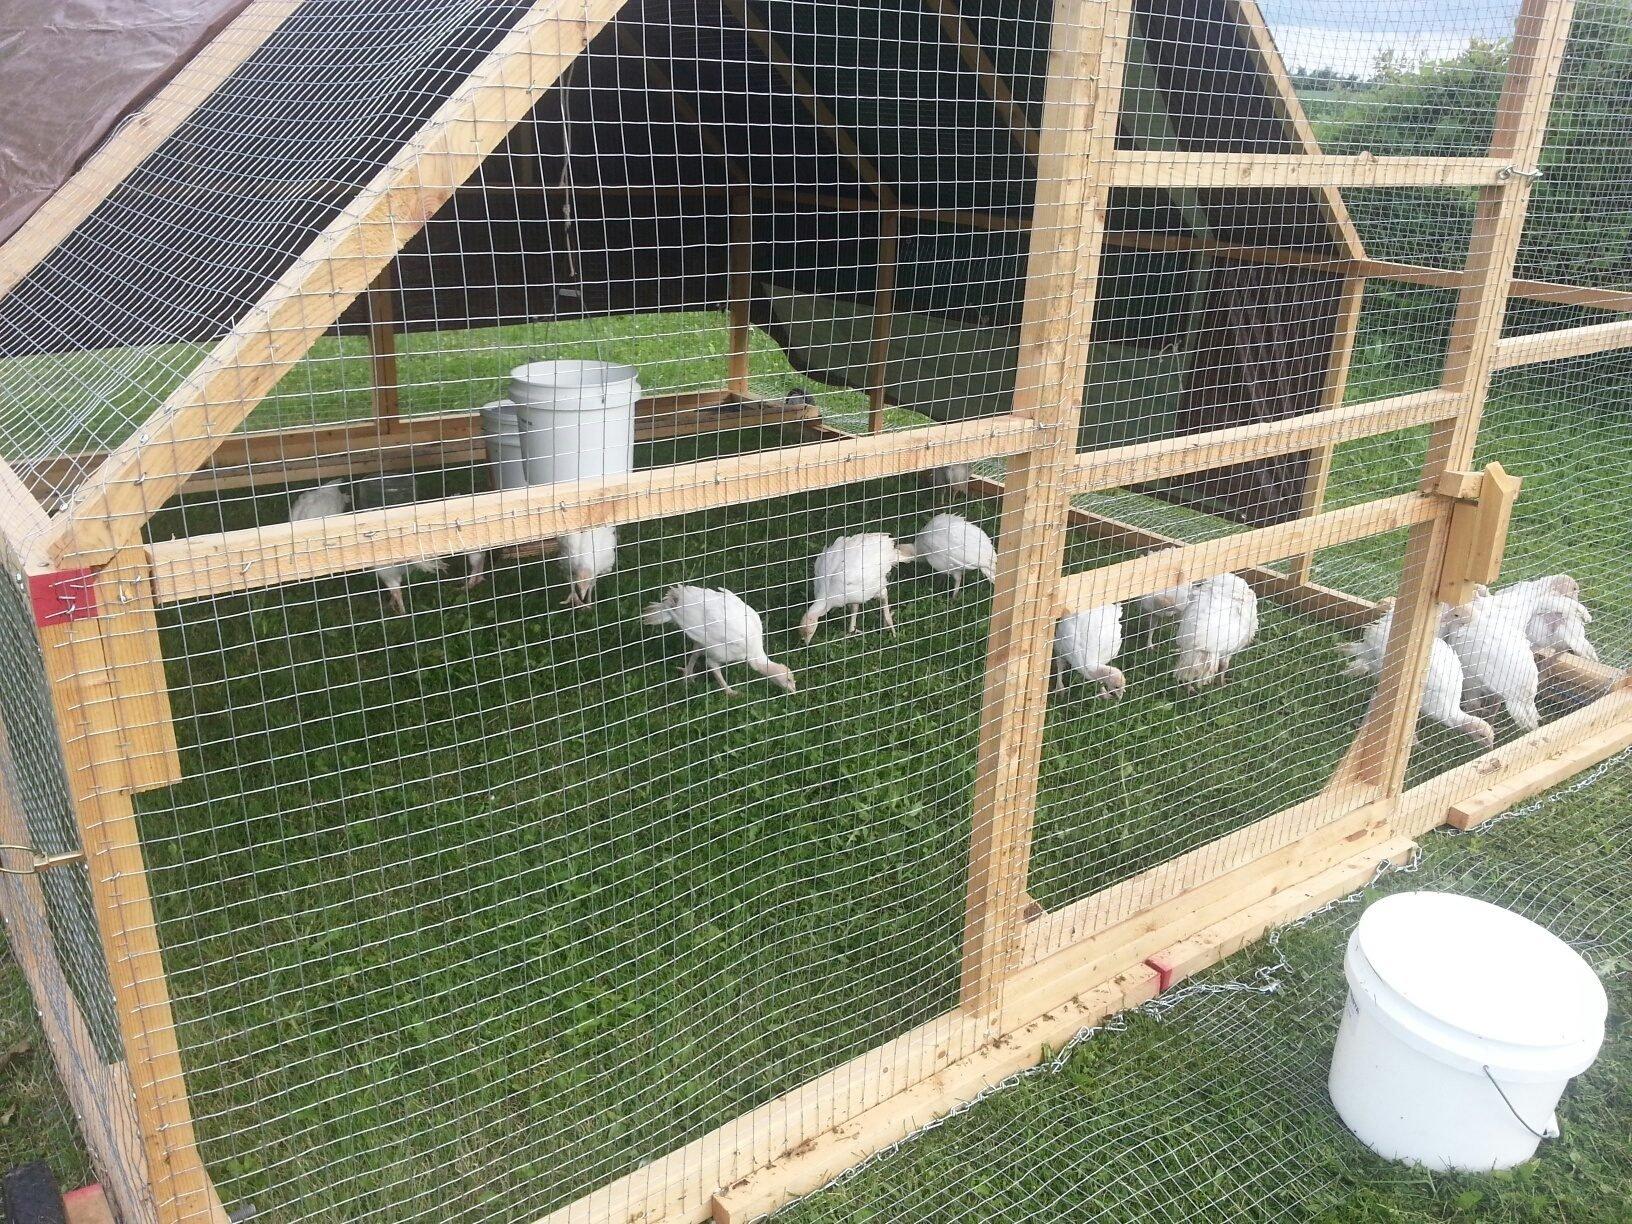 12x10 turkey tractor backyard chickens